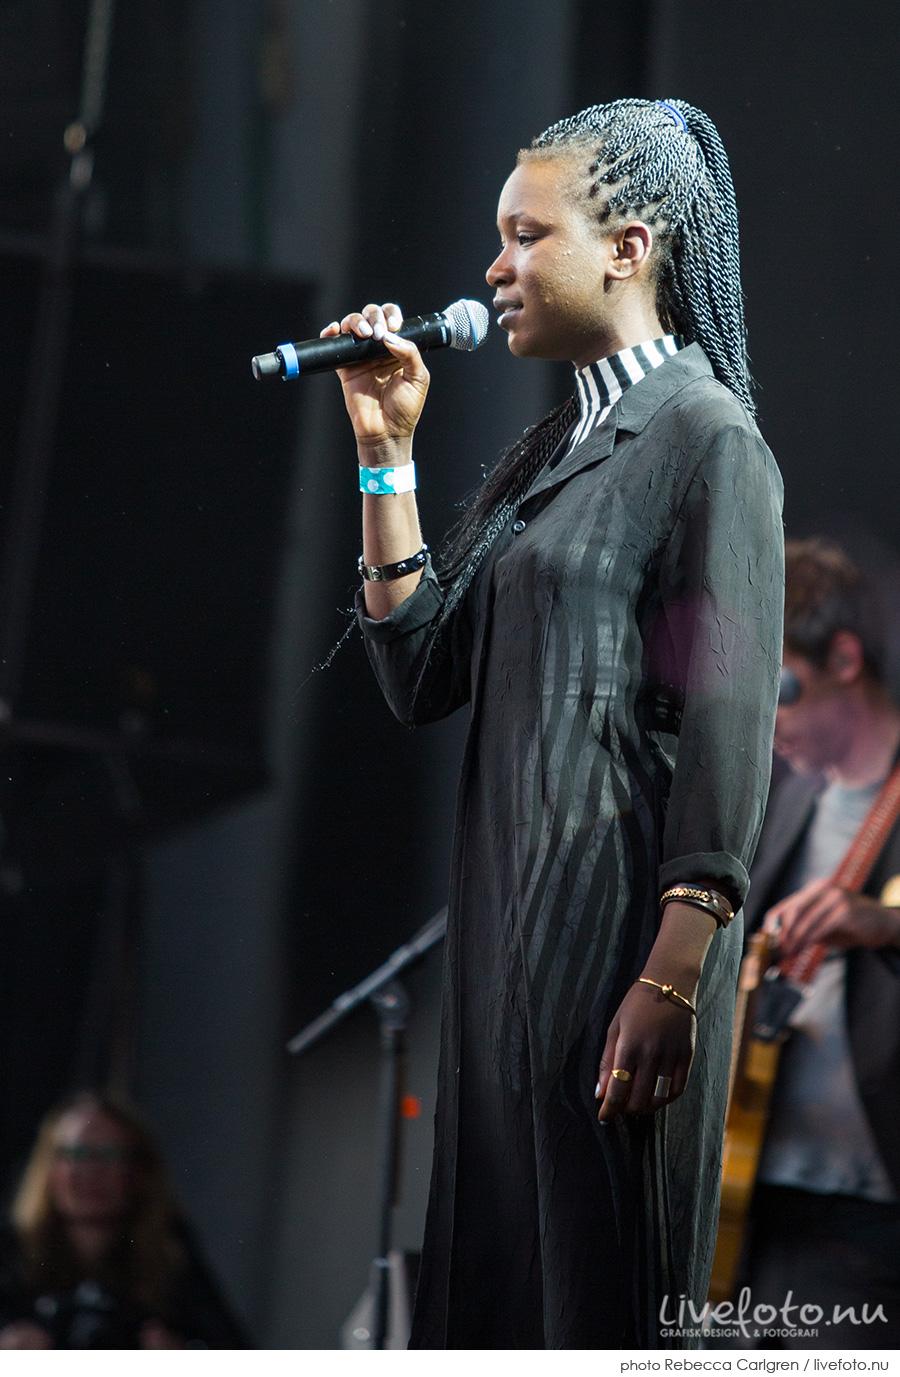 140530_Timbuktu-och-Damn-Liseberg_Foto_Rebecca-Carlgren_livefoto-nu_photo_01-18